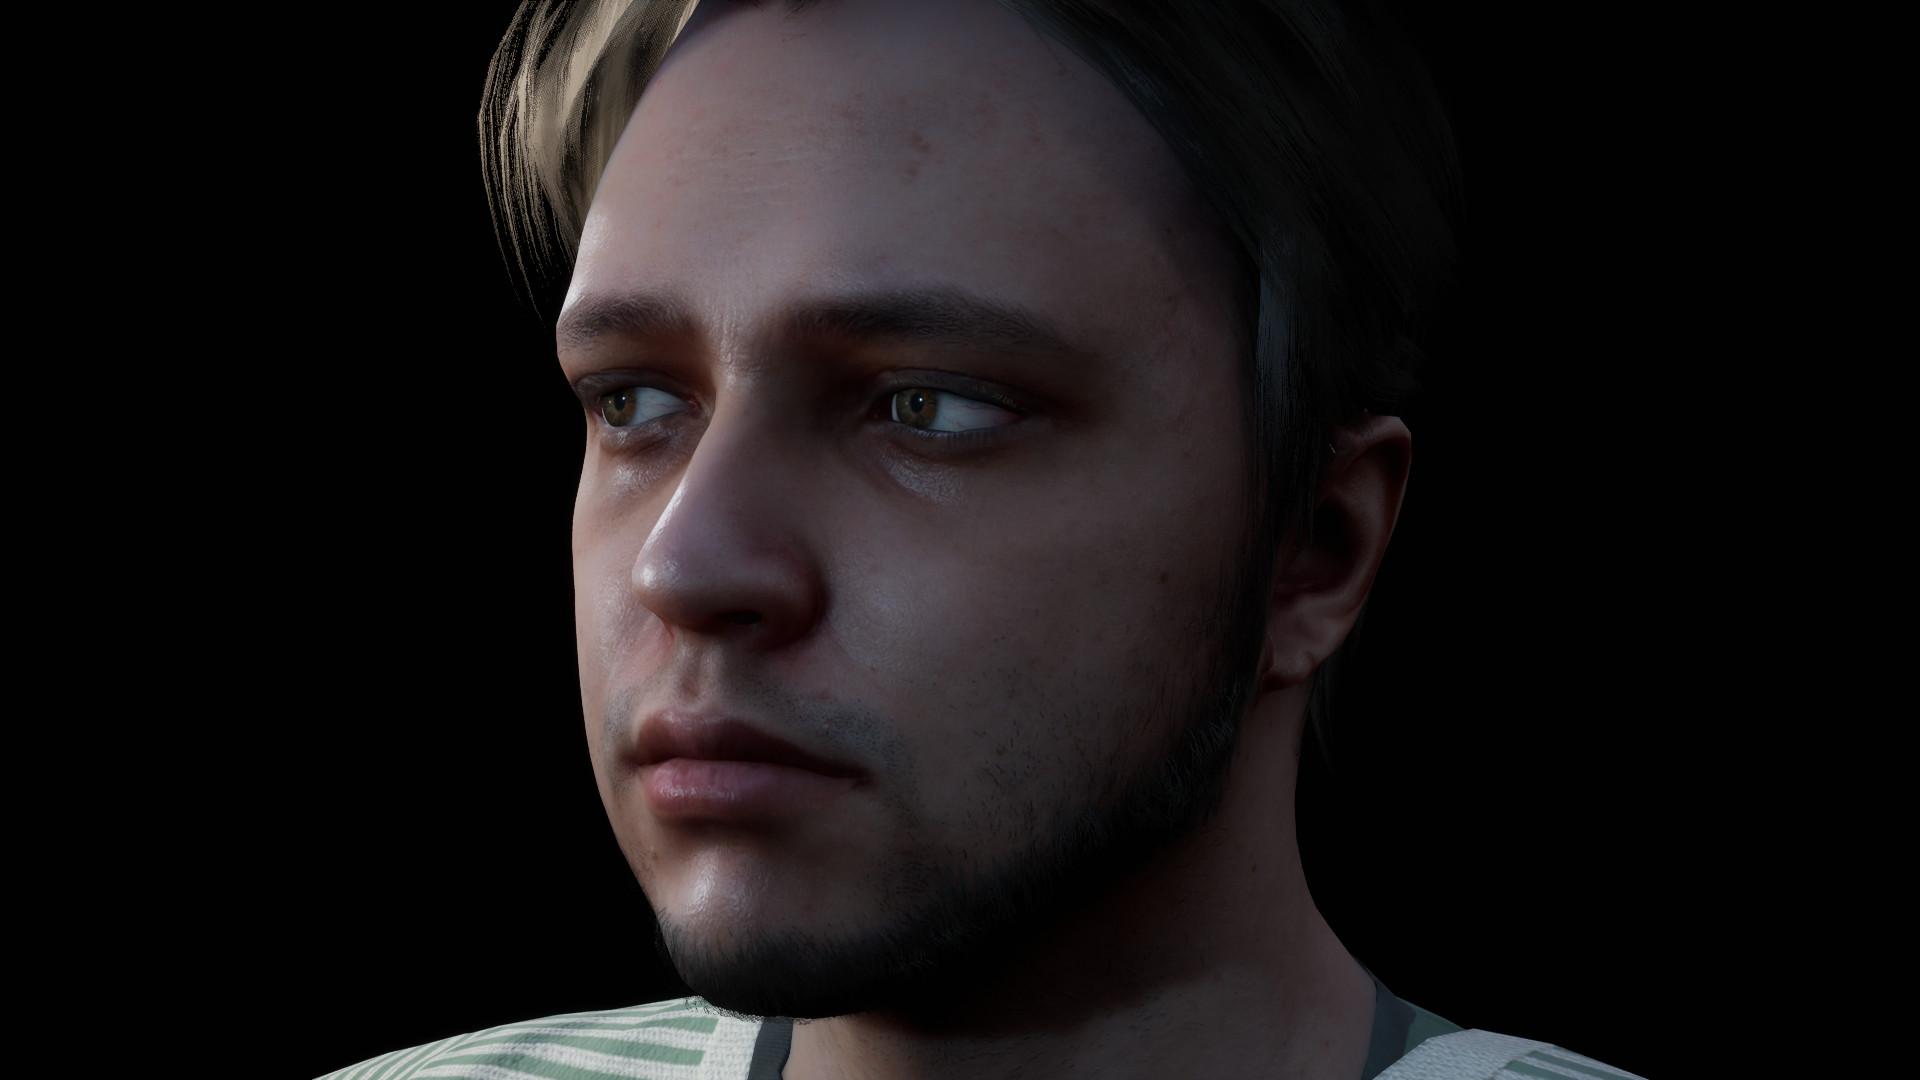 dmitriy masaltsev screenshot0000